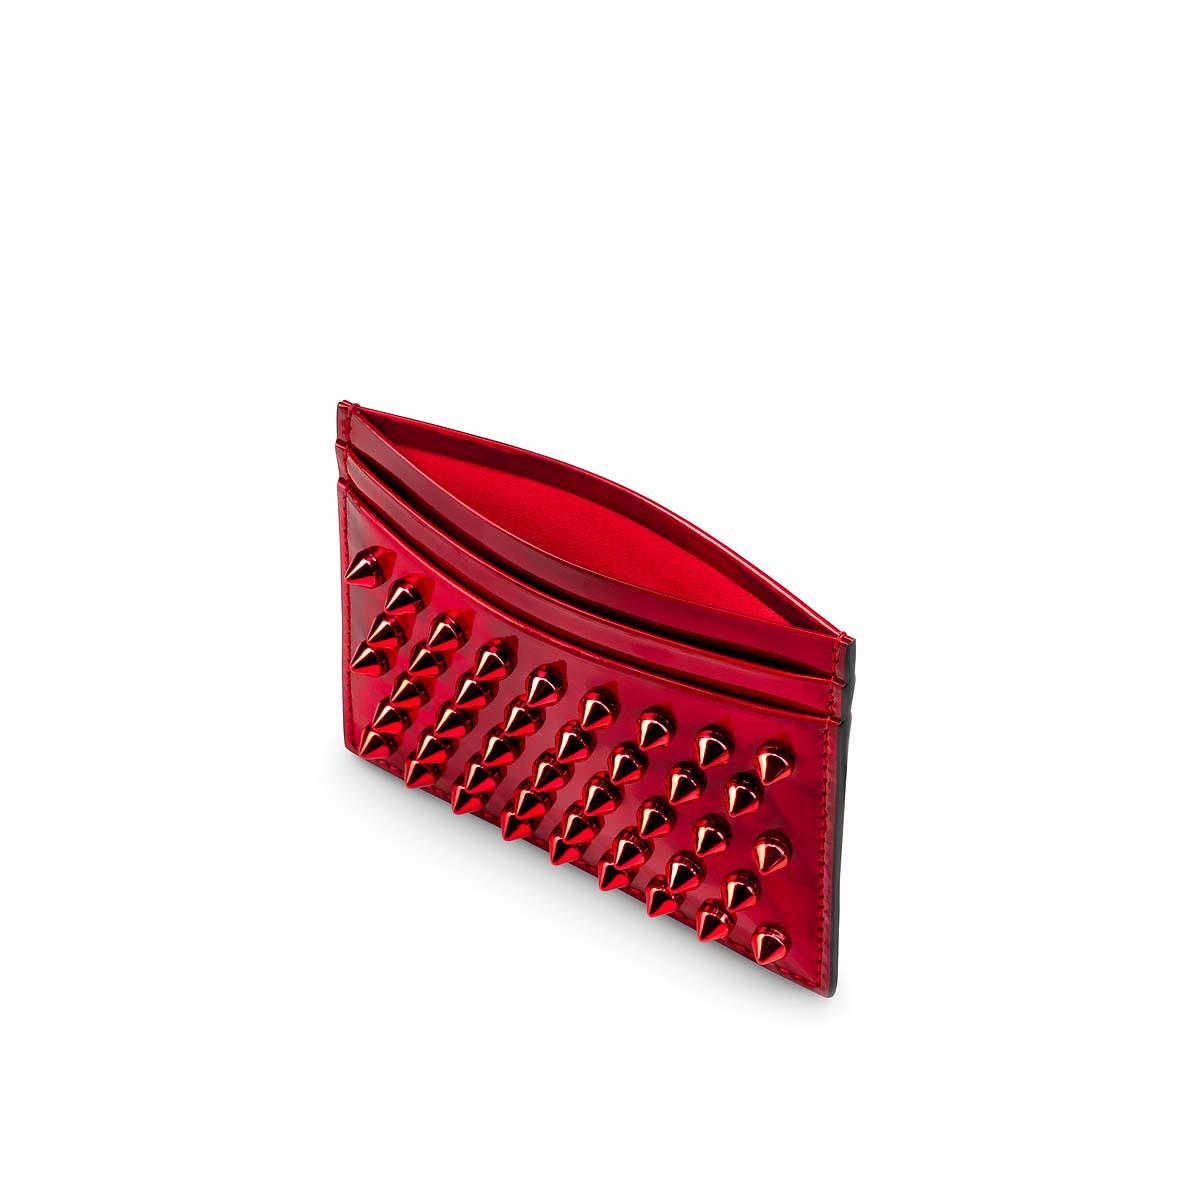 Small Leather Goods - W Kios Card Holder - Christian Louboutin